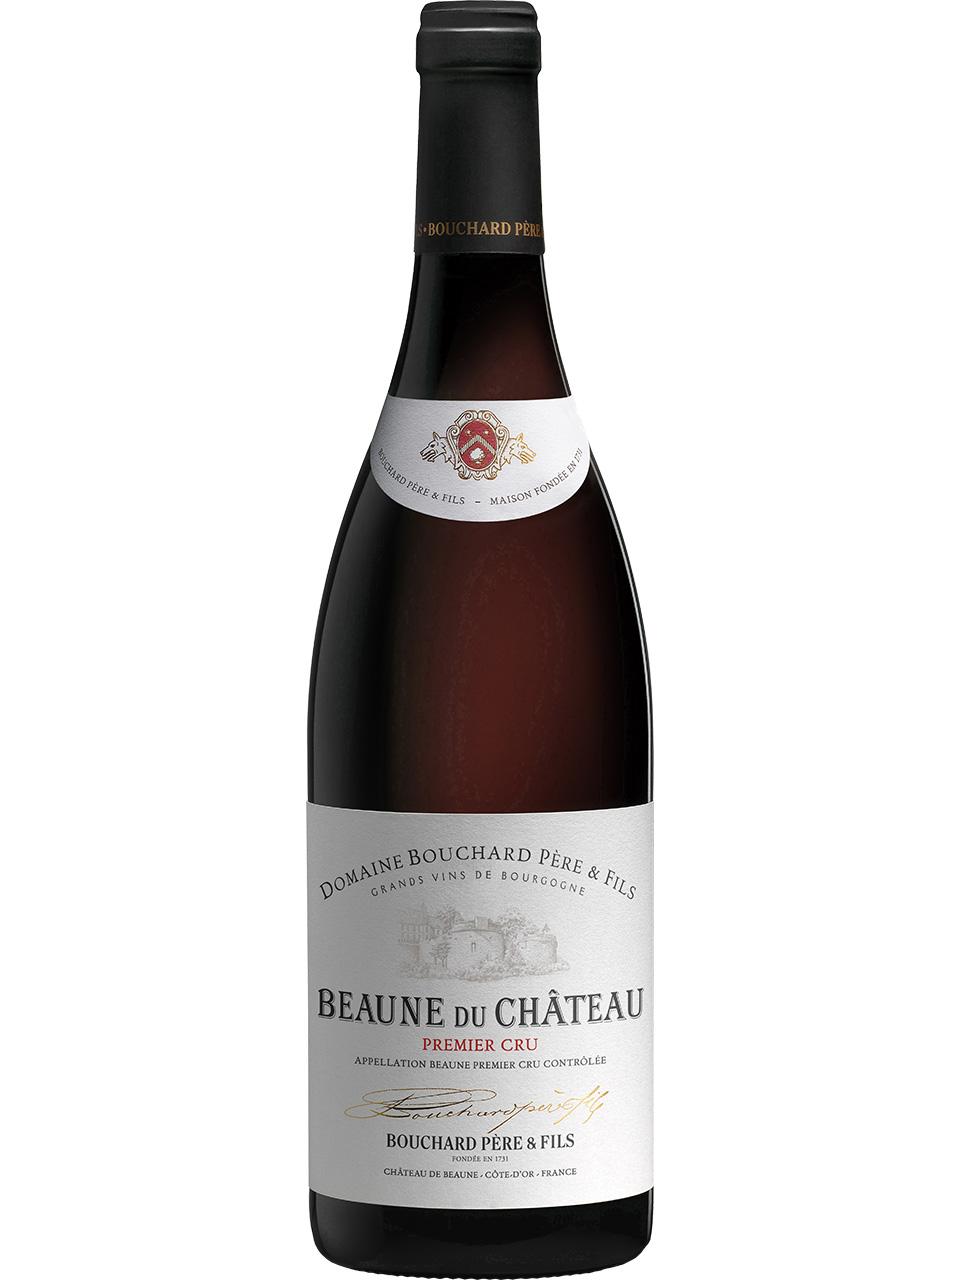 Bouchard Pere et Fils Beaune du Chateau 1 cru 2017